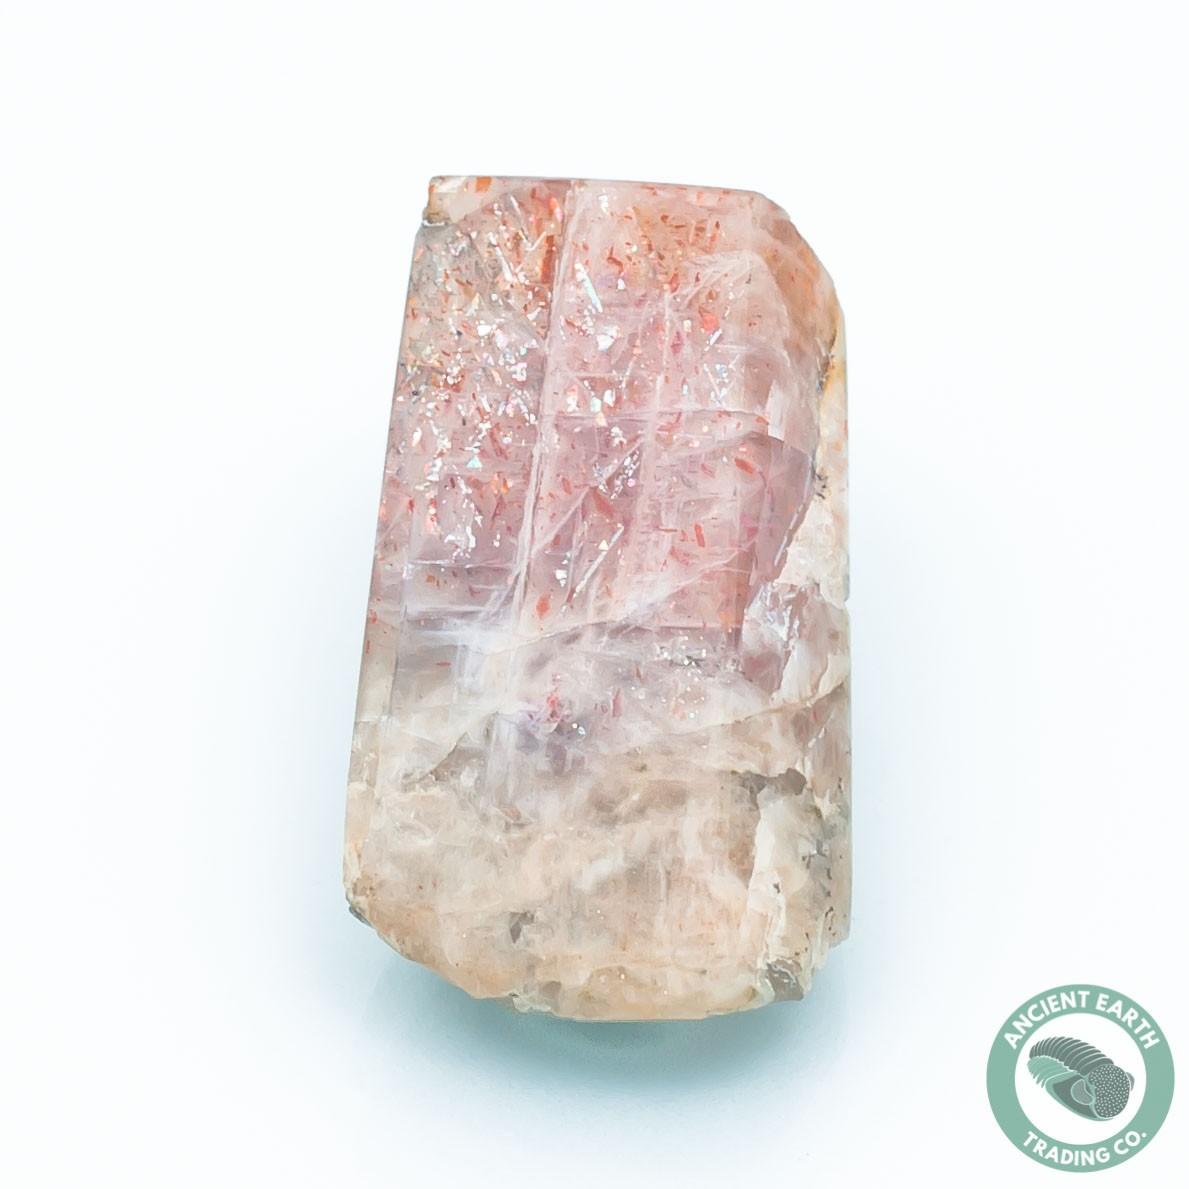 41.9 carat Rainbow Lattice Sunstone - Australia